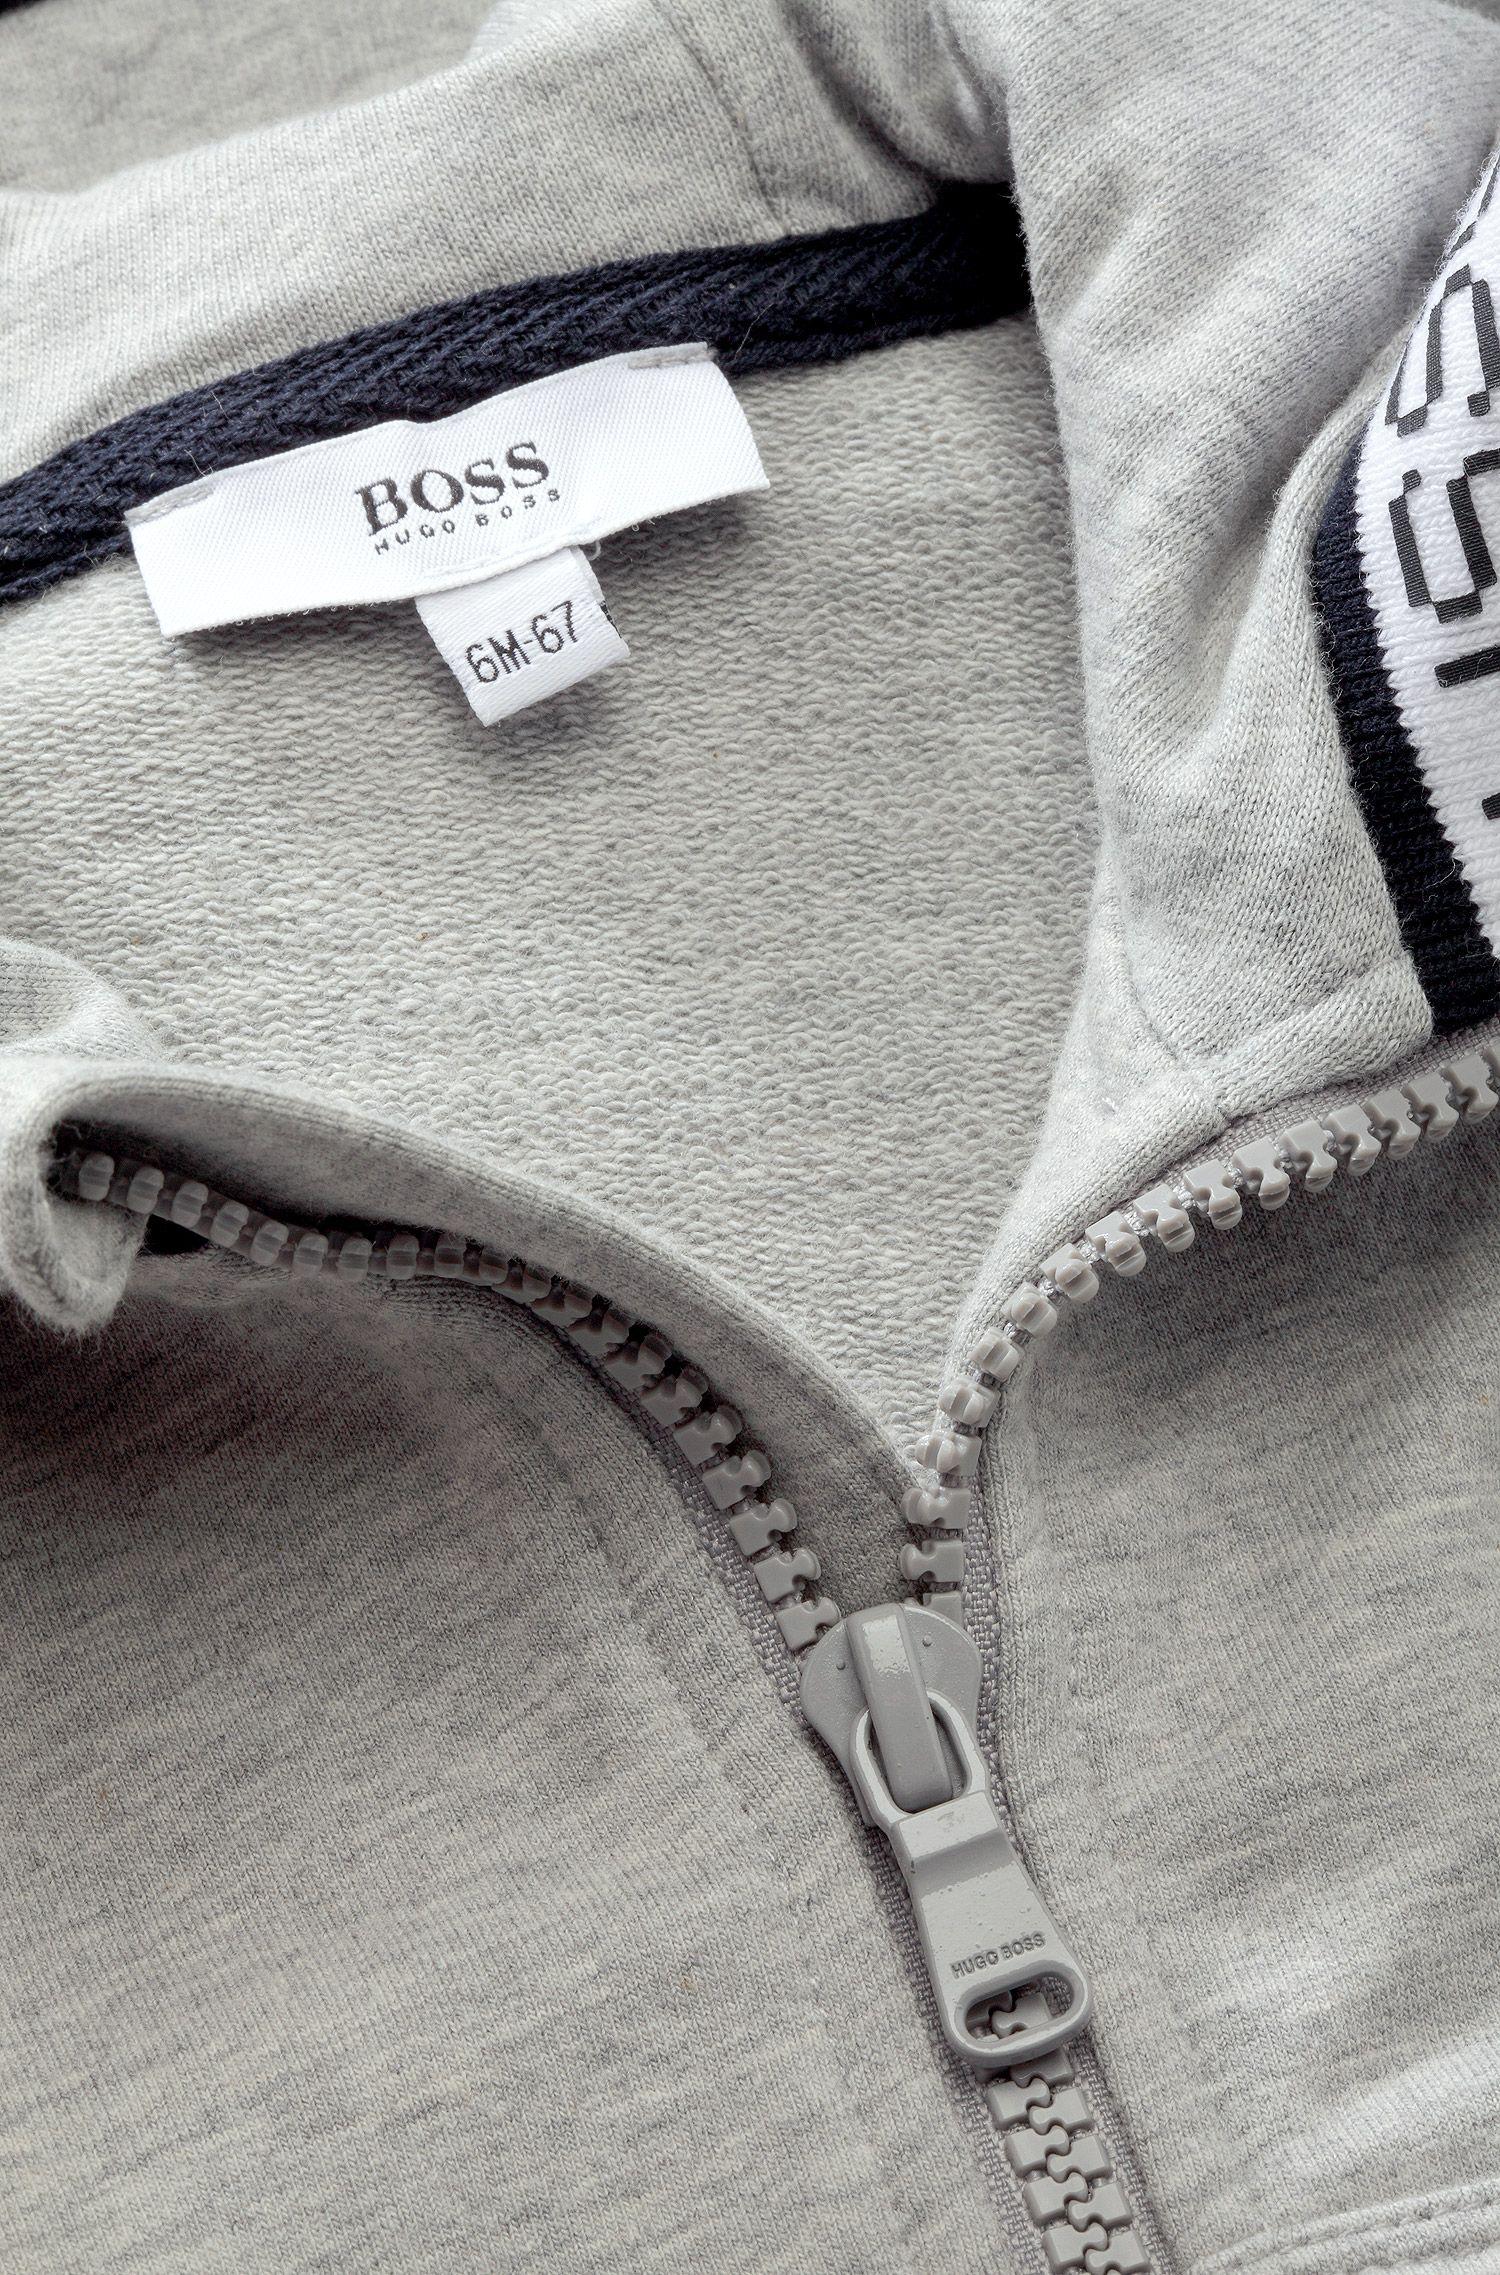 Kids-Kapuzen-Sweatshirt-Jacke ´J05358` aus Baumwoll-Mix